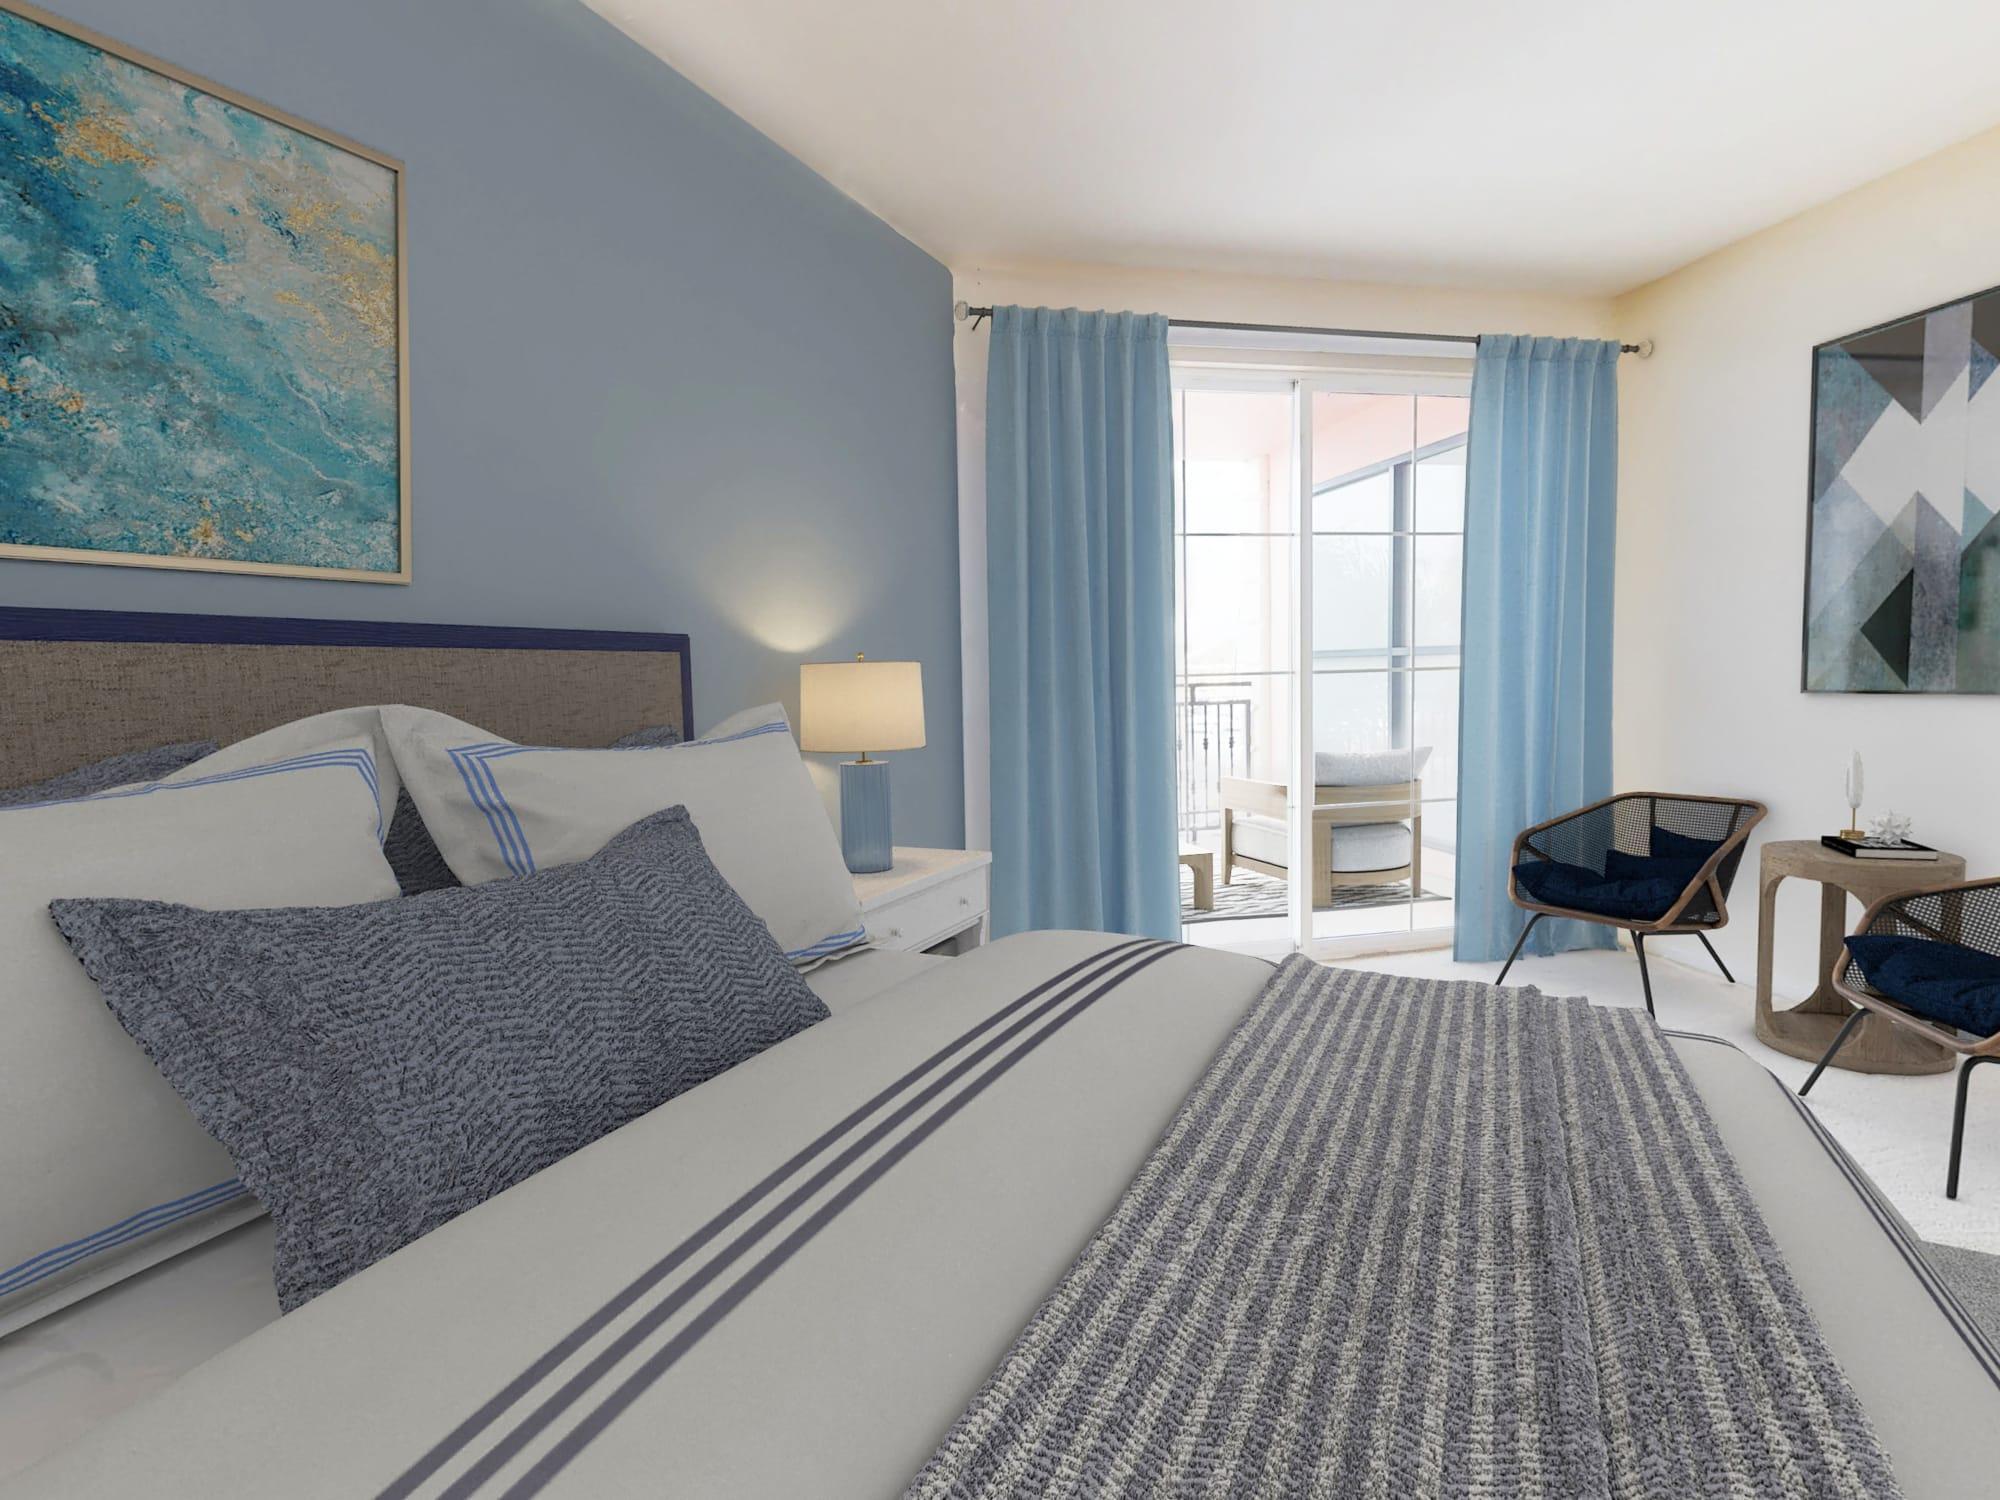 Extra large bedroom with sitting area and balcony overlooking waterfront marina at The Villa at Marina Harbor in Marina del Rey, California